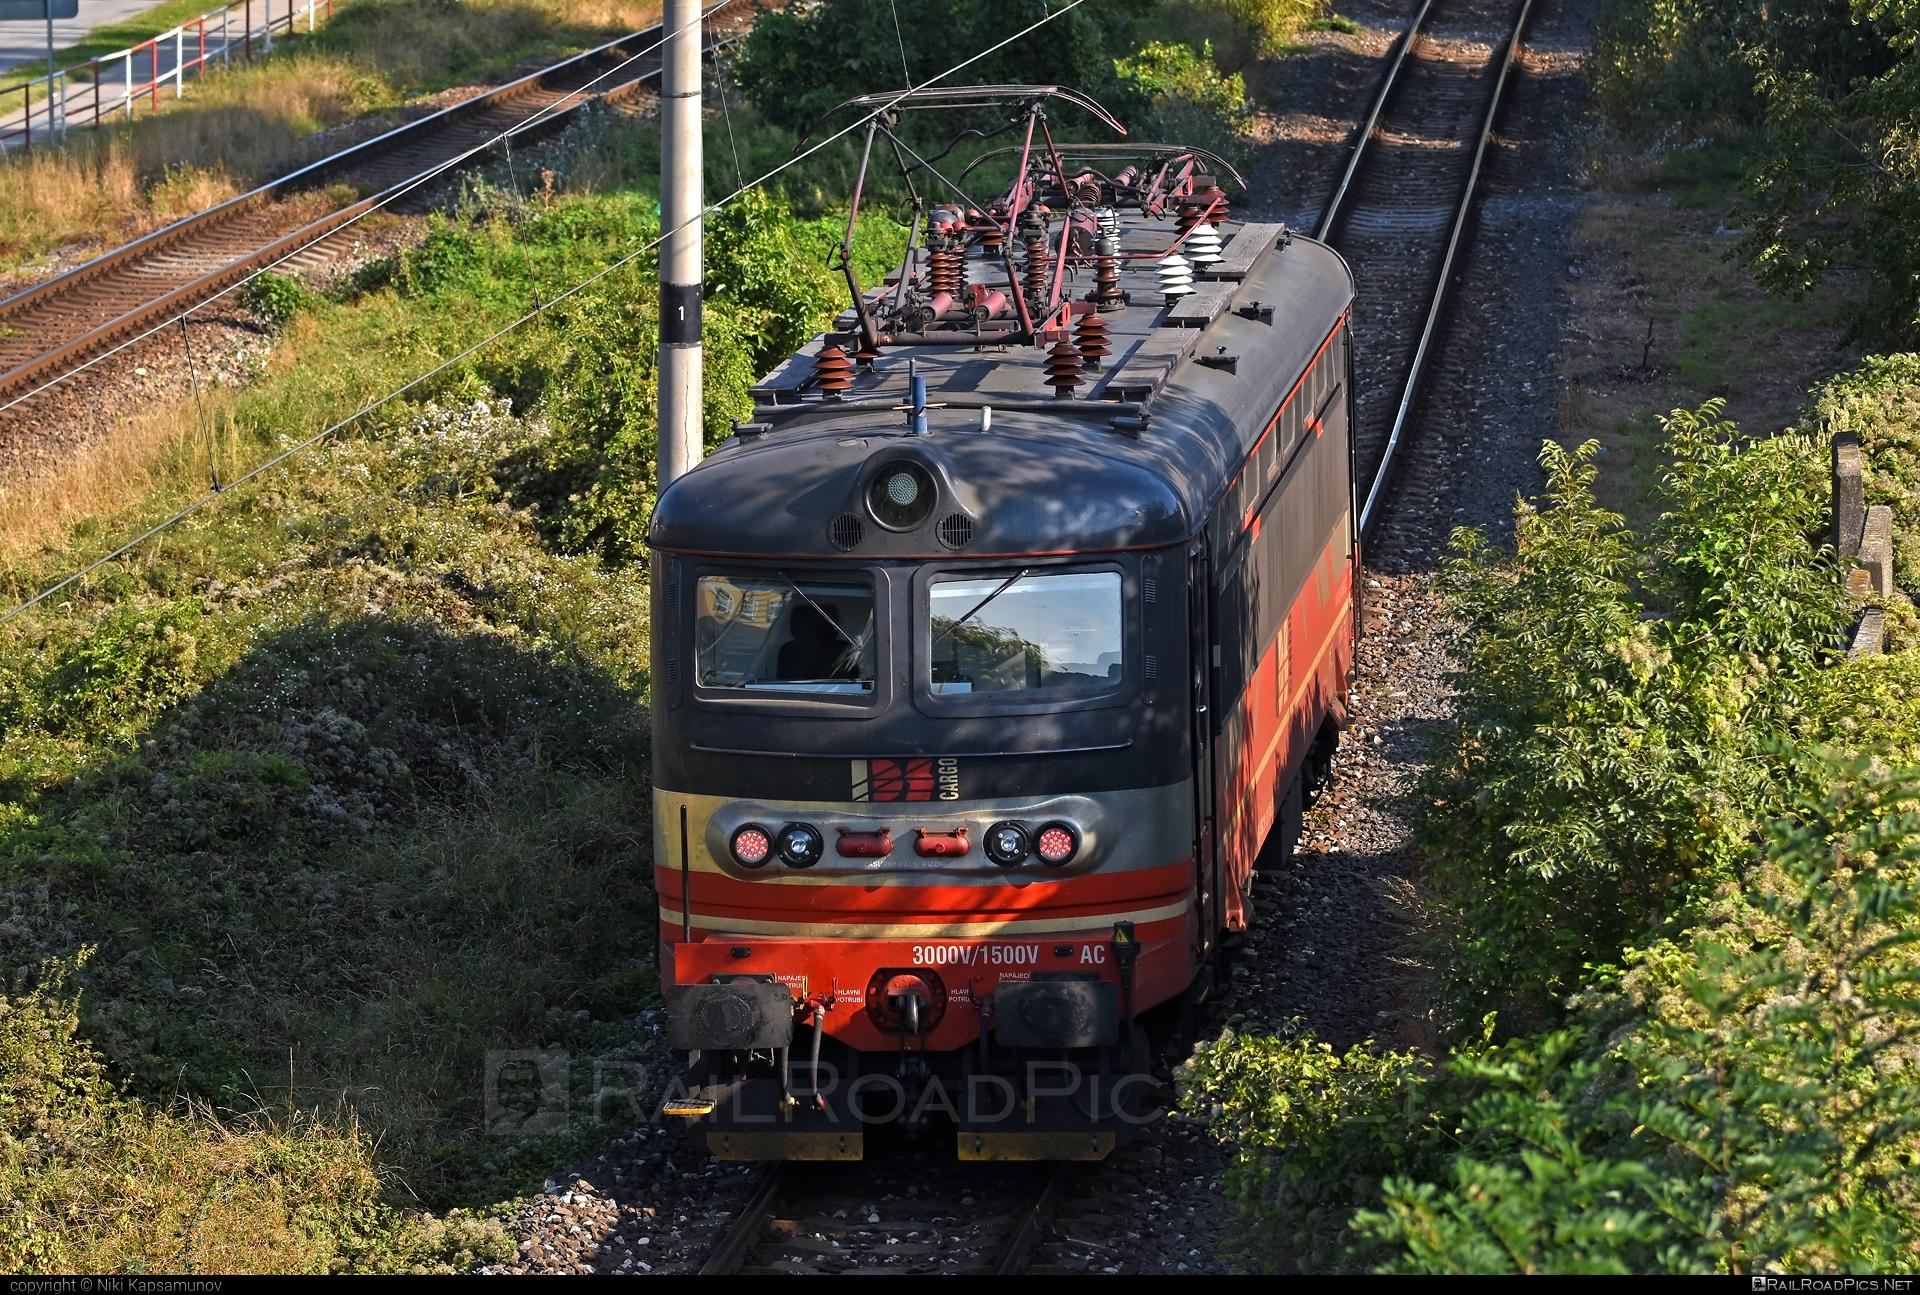 Škoda 73E - 045 193-7 operated by IDS CARGO a. s. #idsc #idscargo #locomotive242 #plechac #skoda #skoda73e